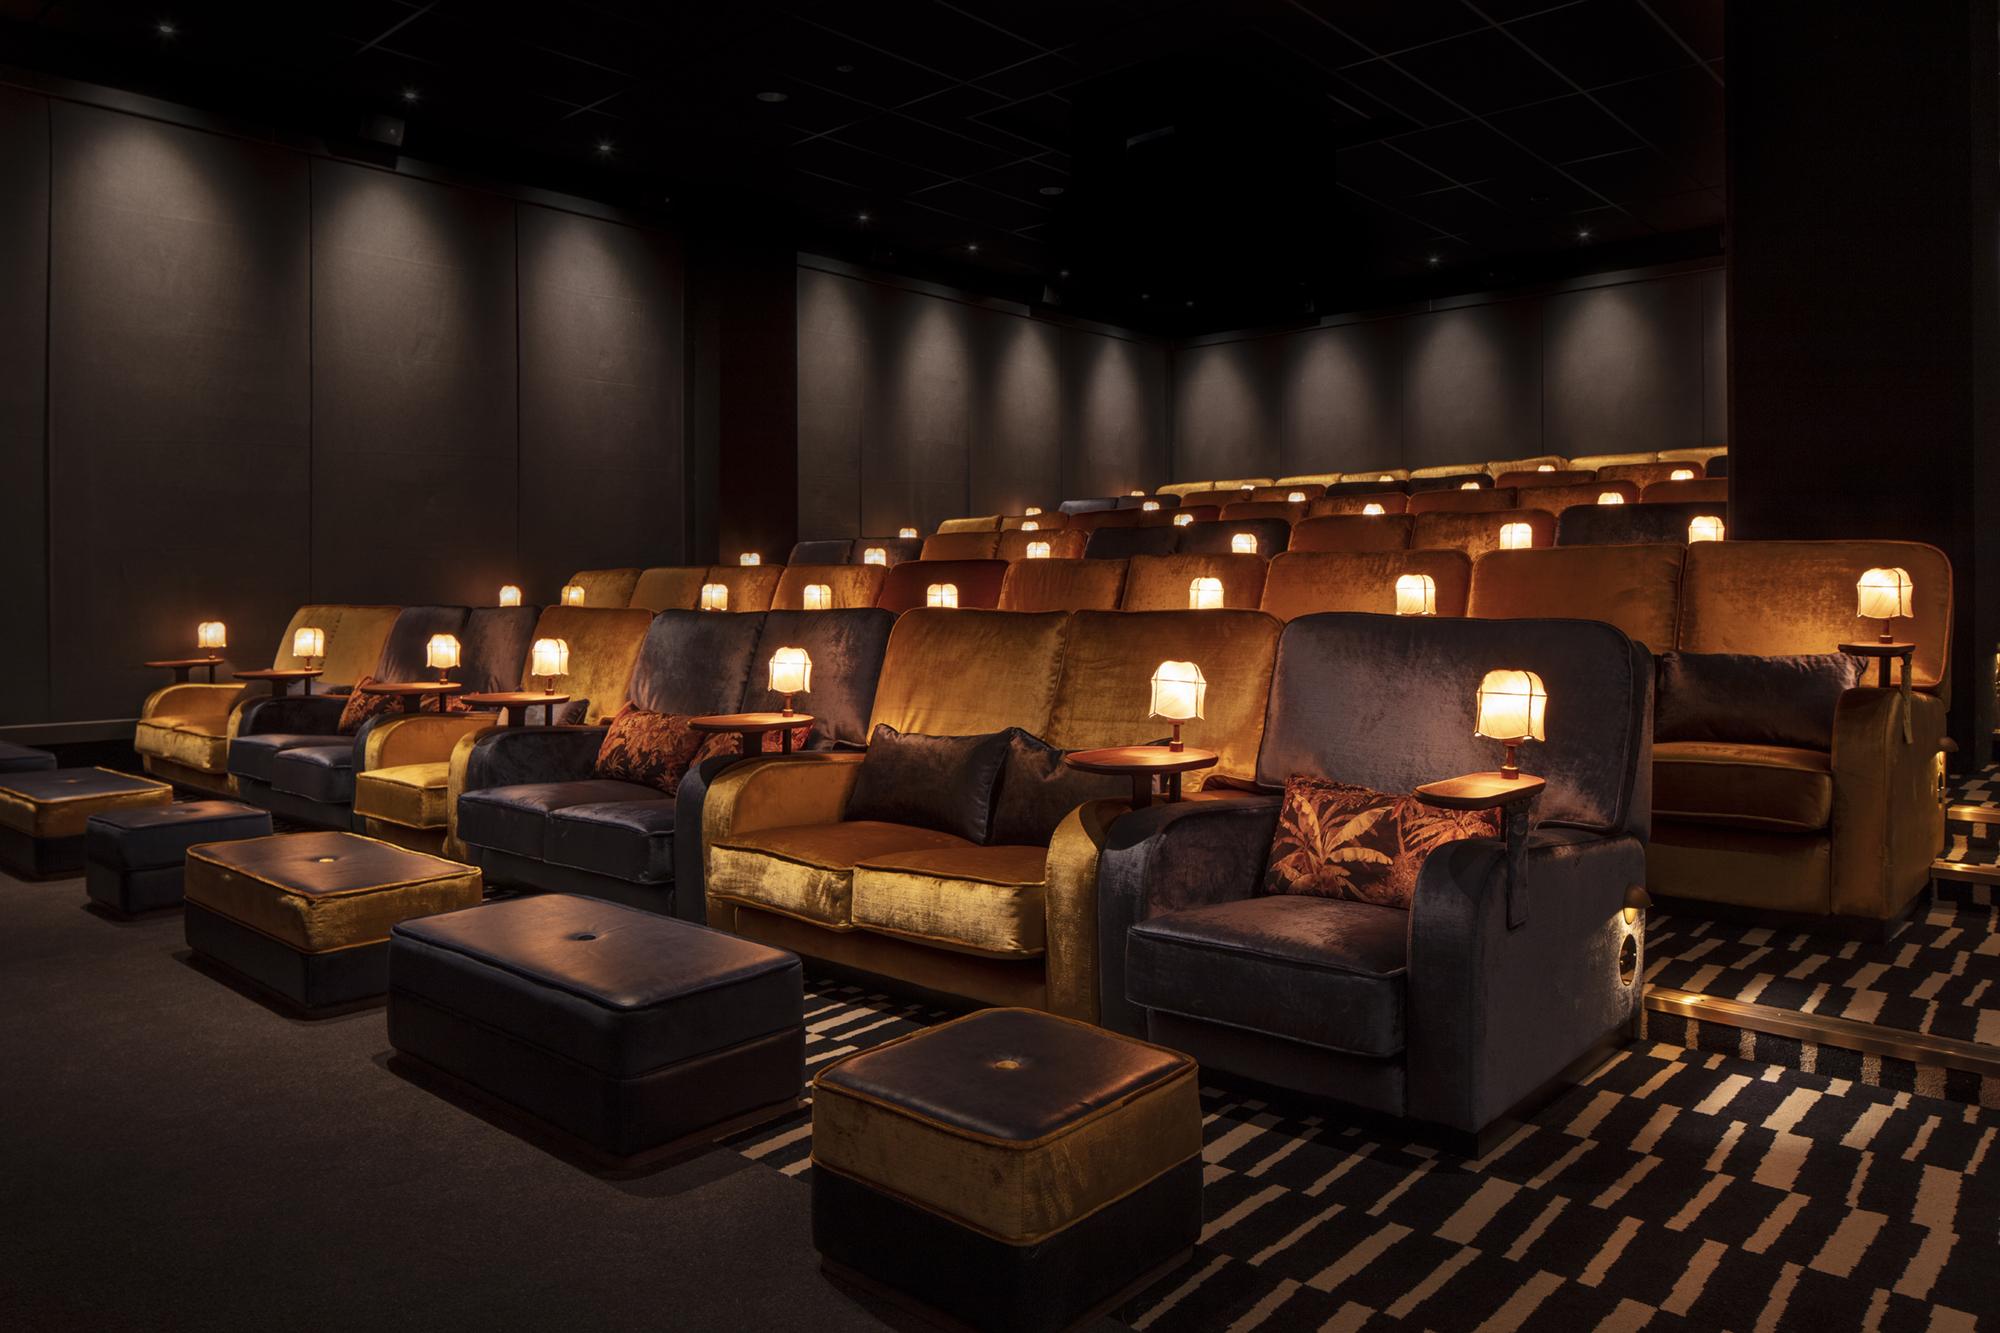 Tivoli cinema seats